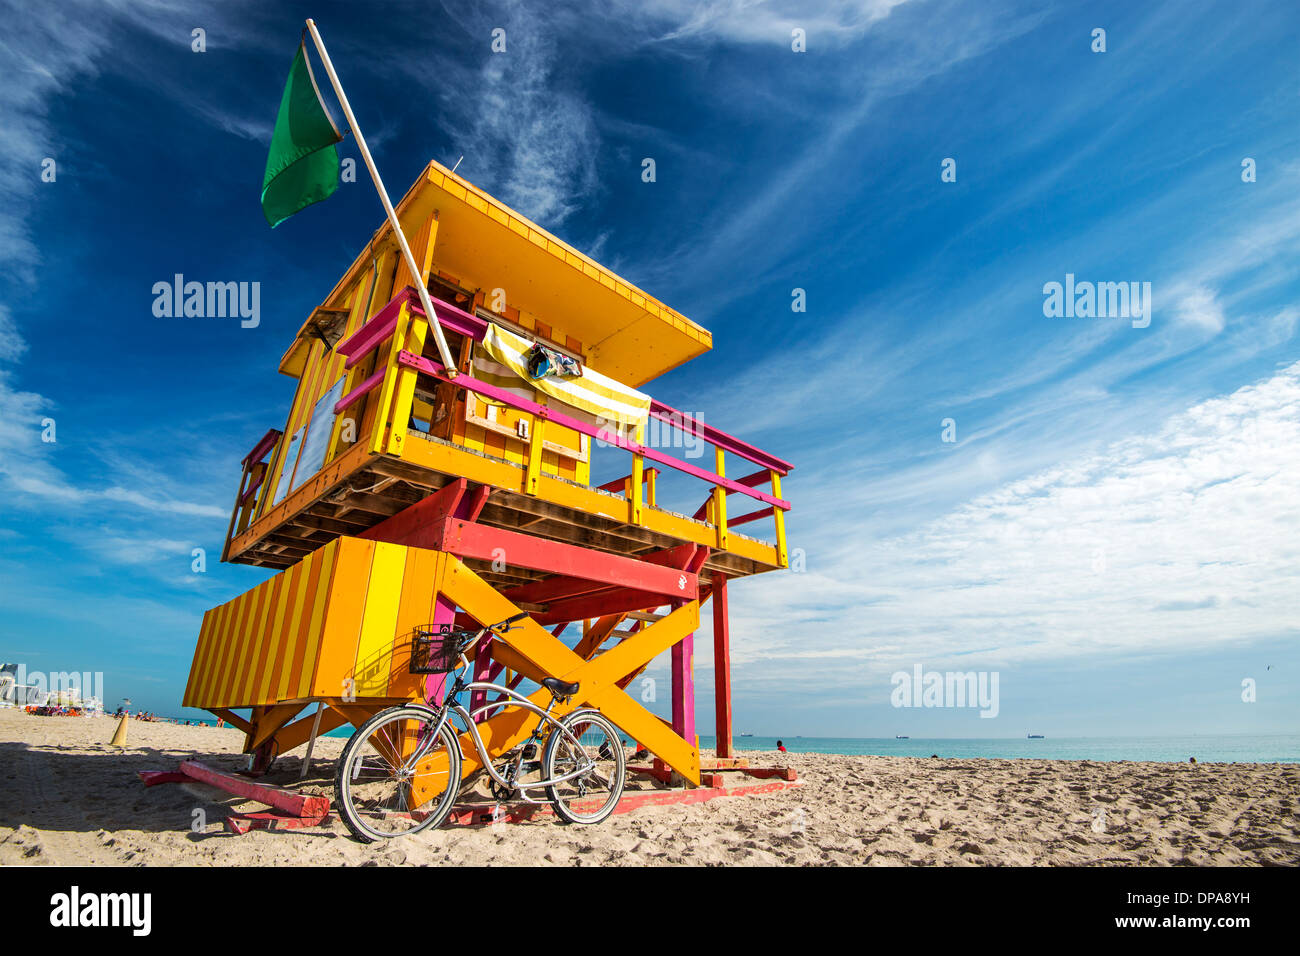 South Beach, Miami, Florida, USA Rettungsschwimmer post. Stockbild